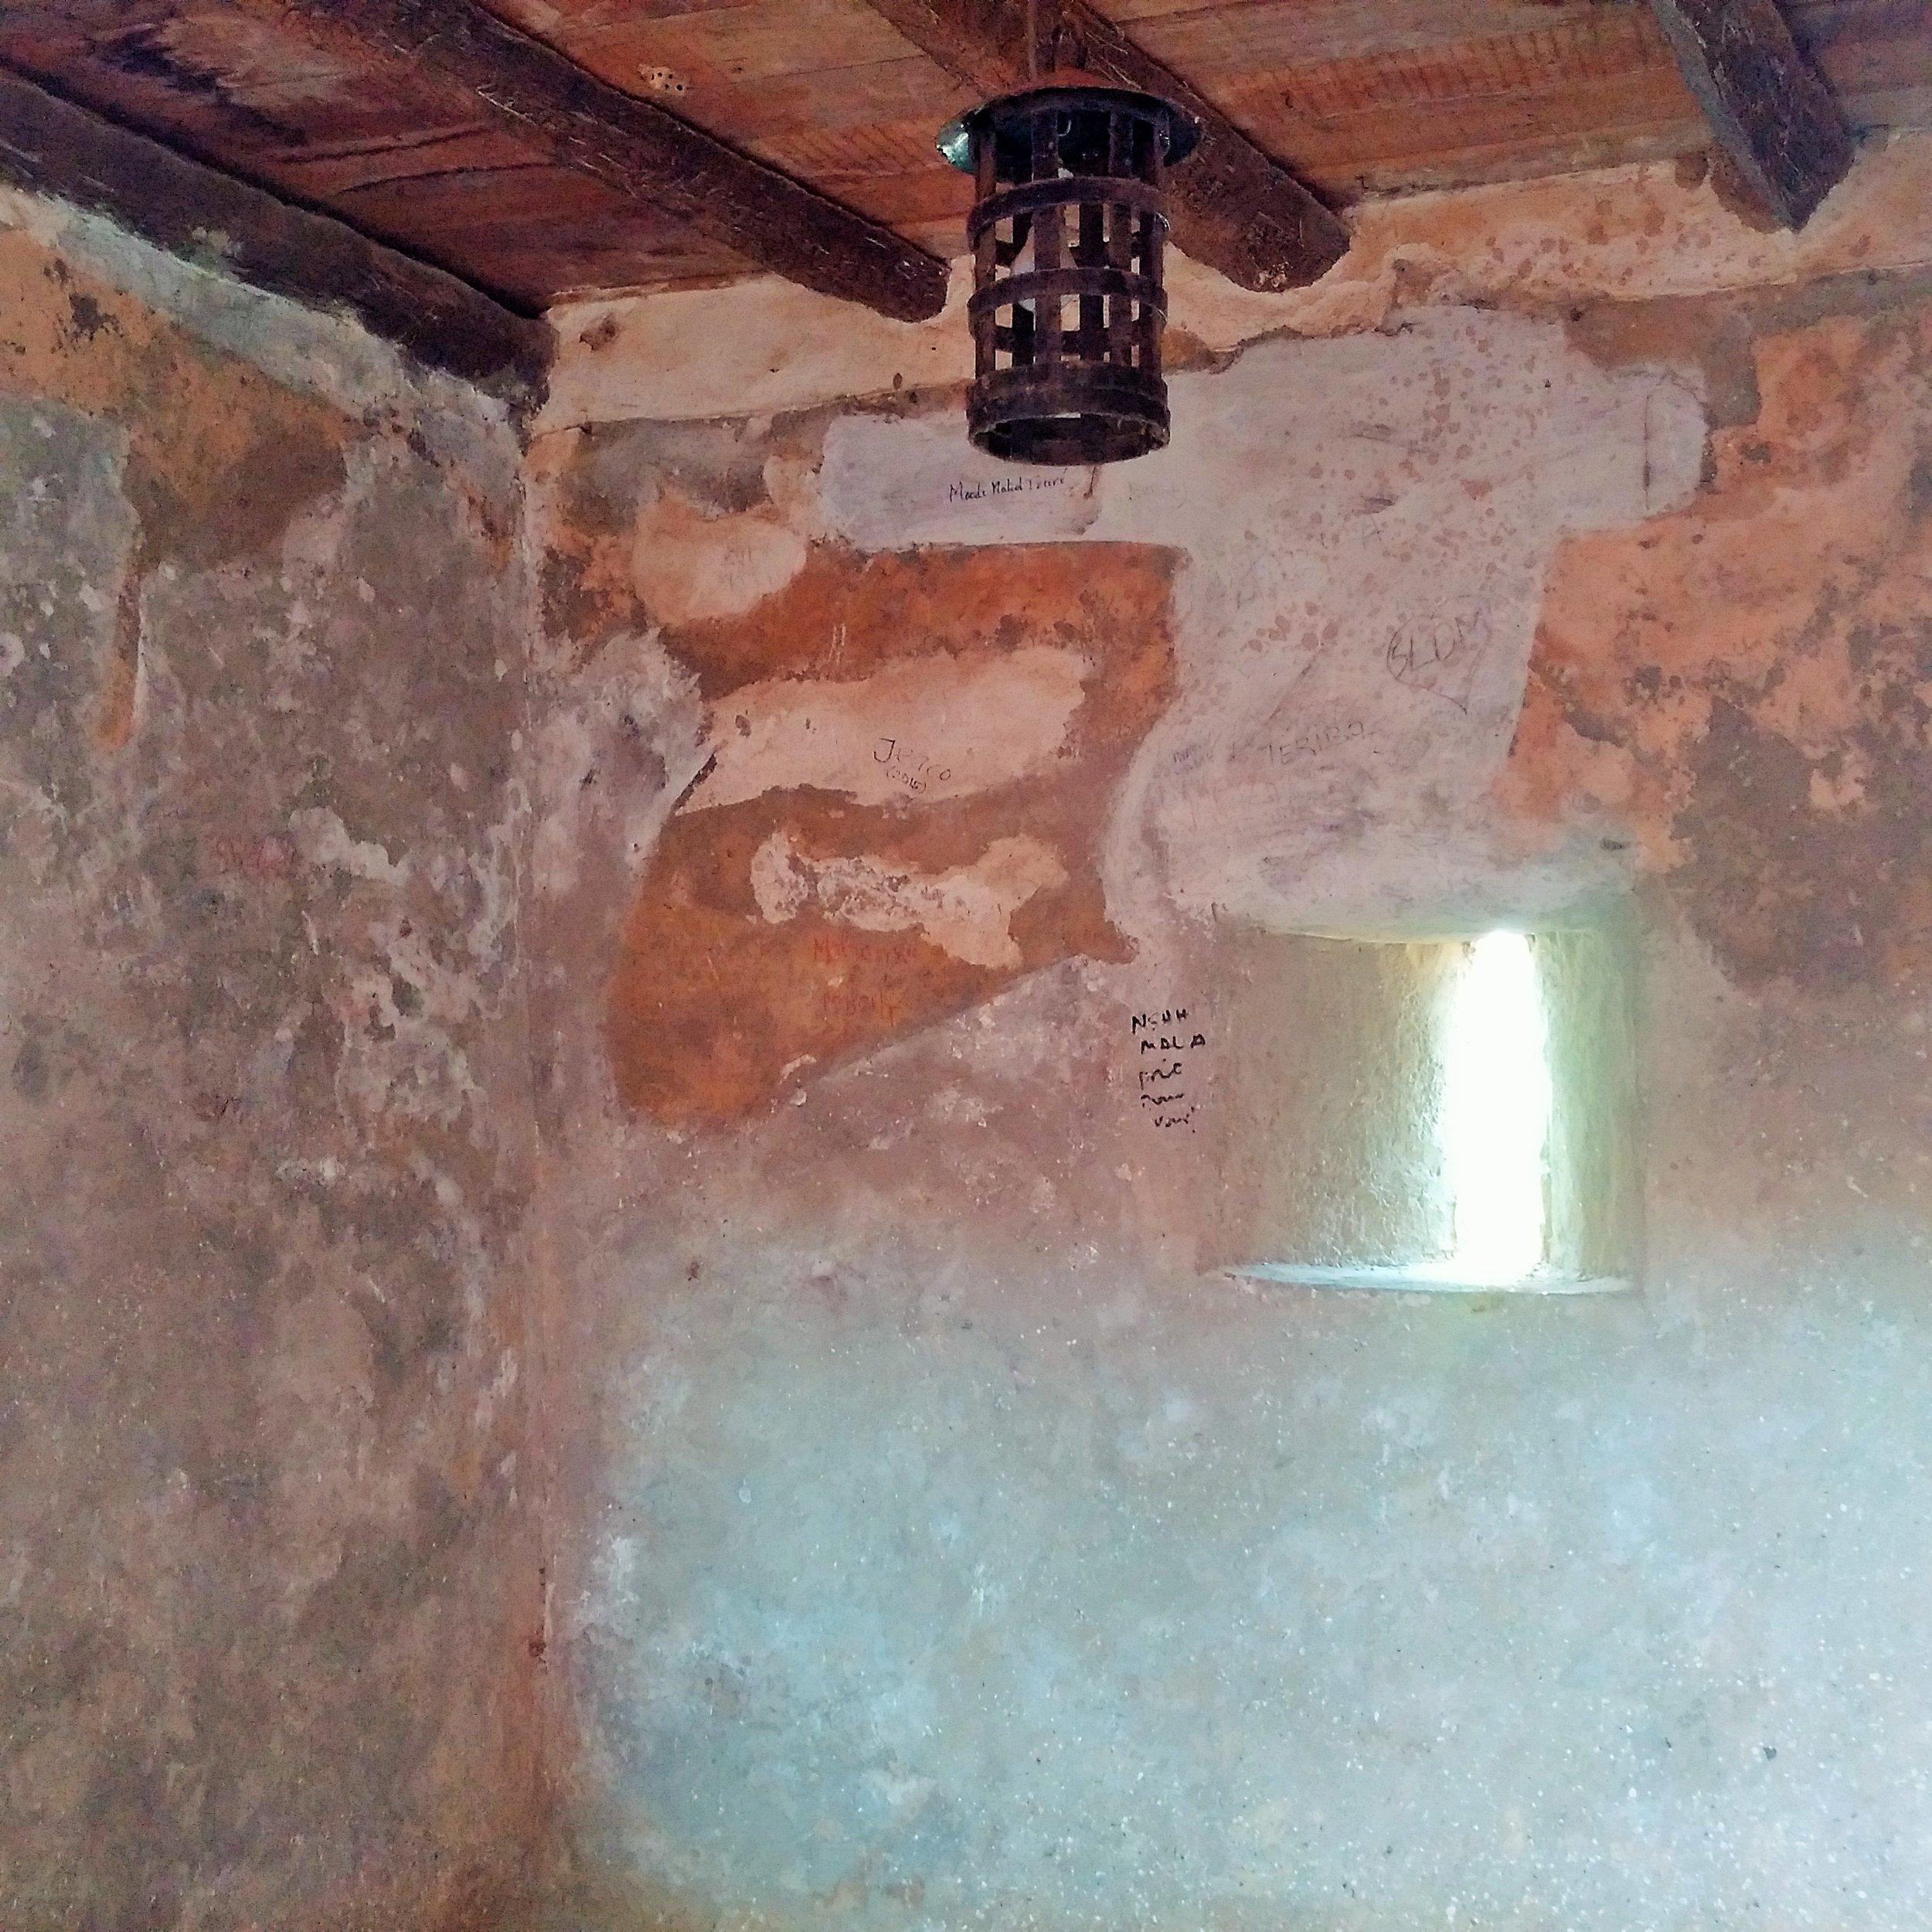 Slave dungeons at Goree Island